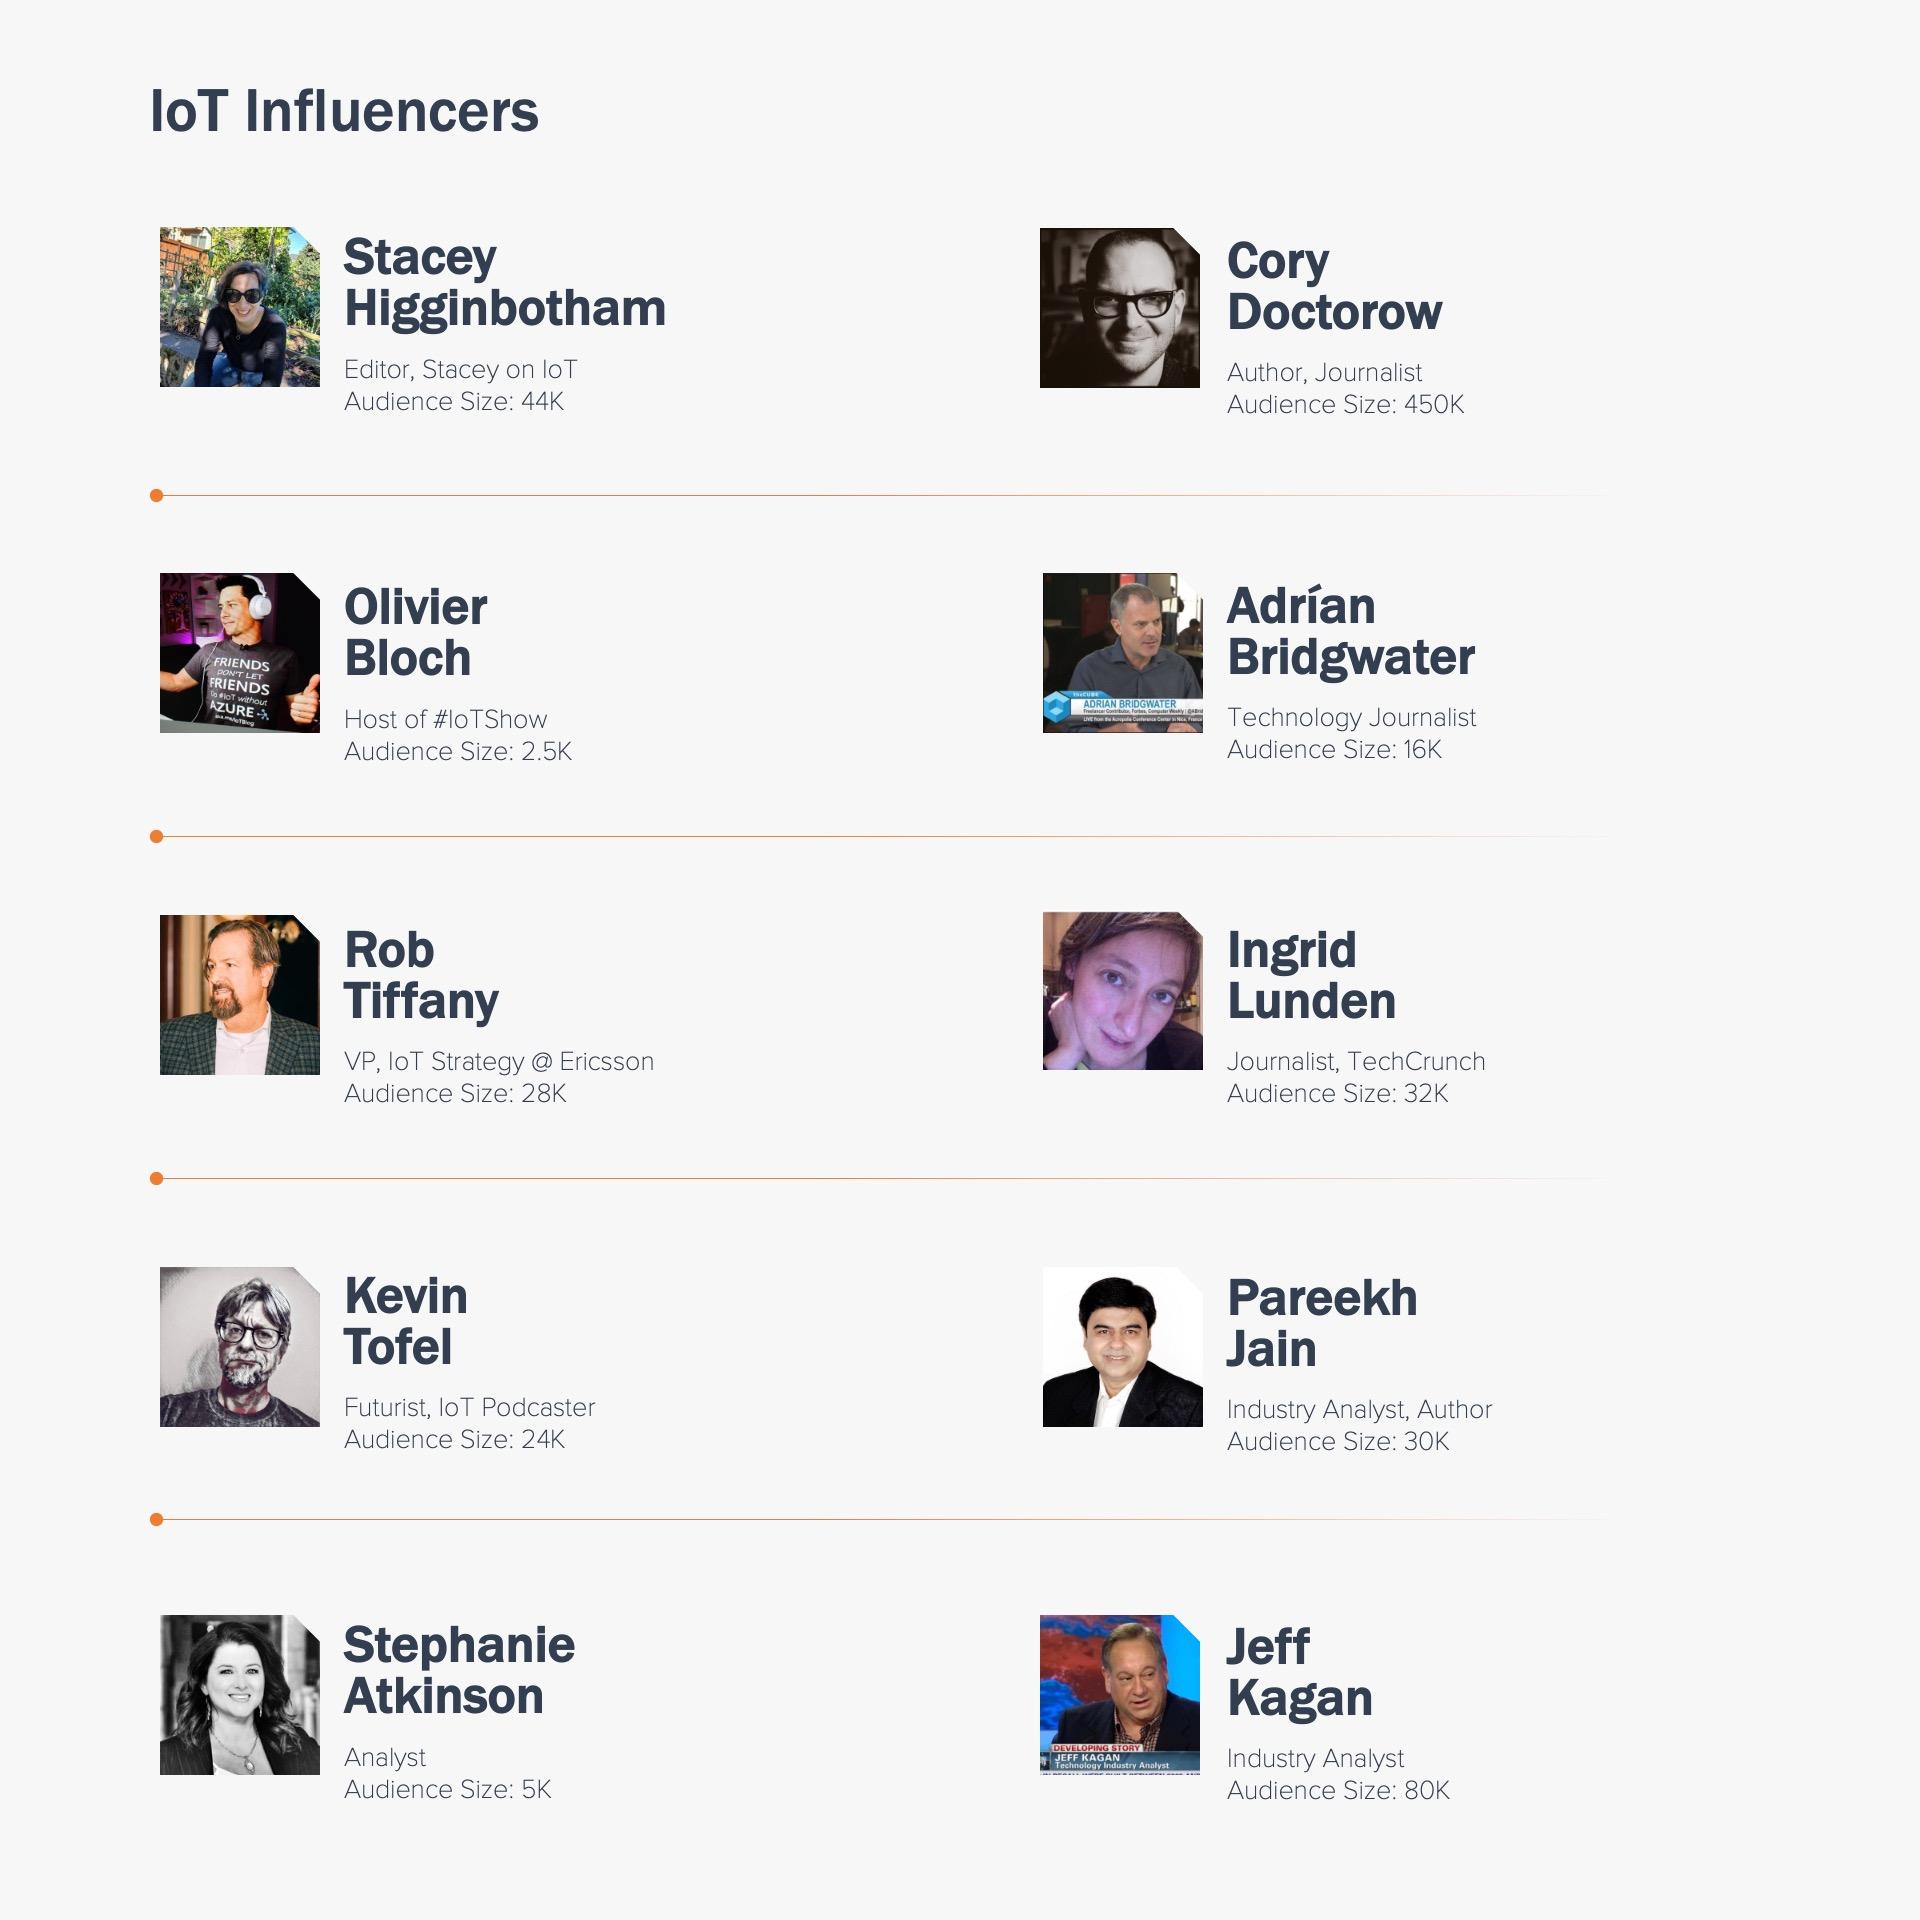 IoT Influencers